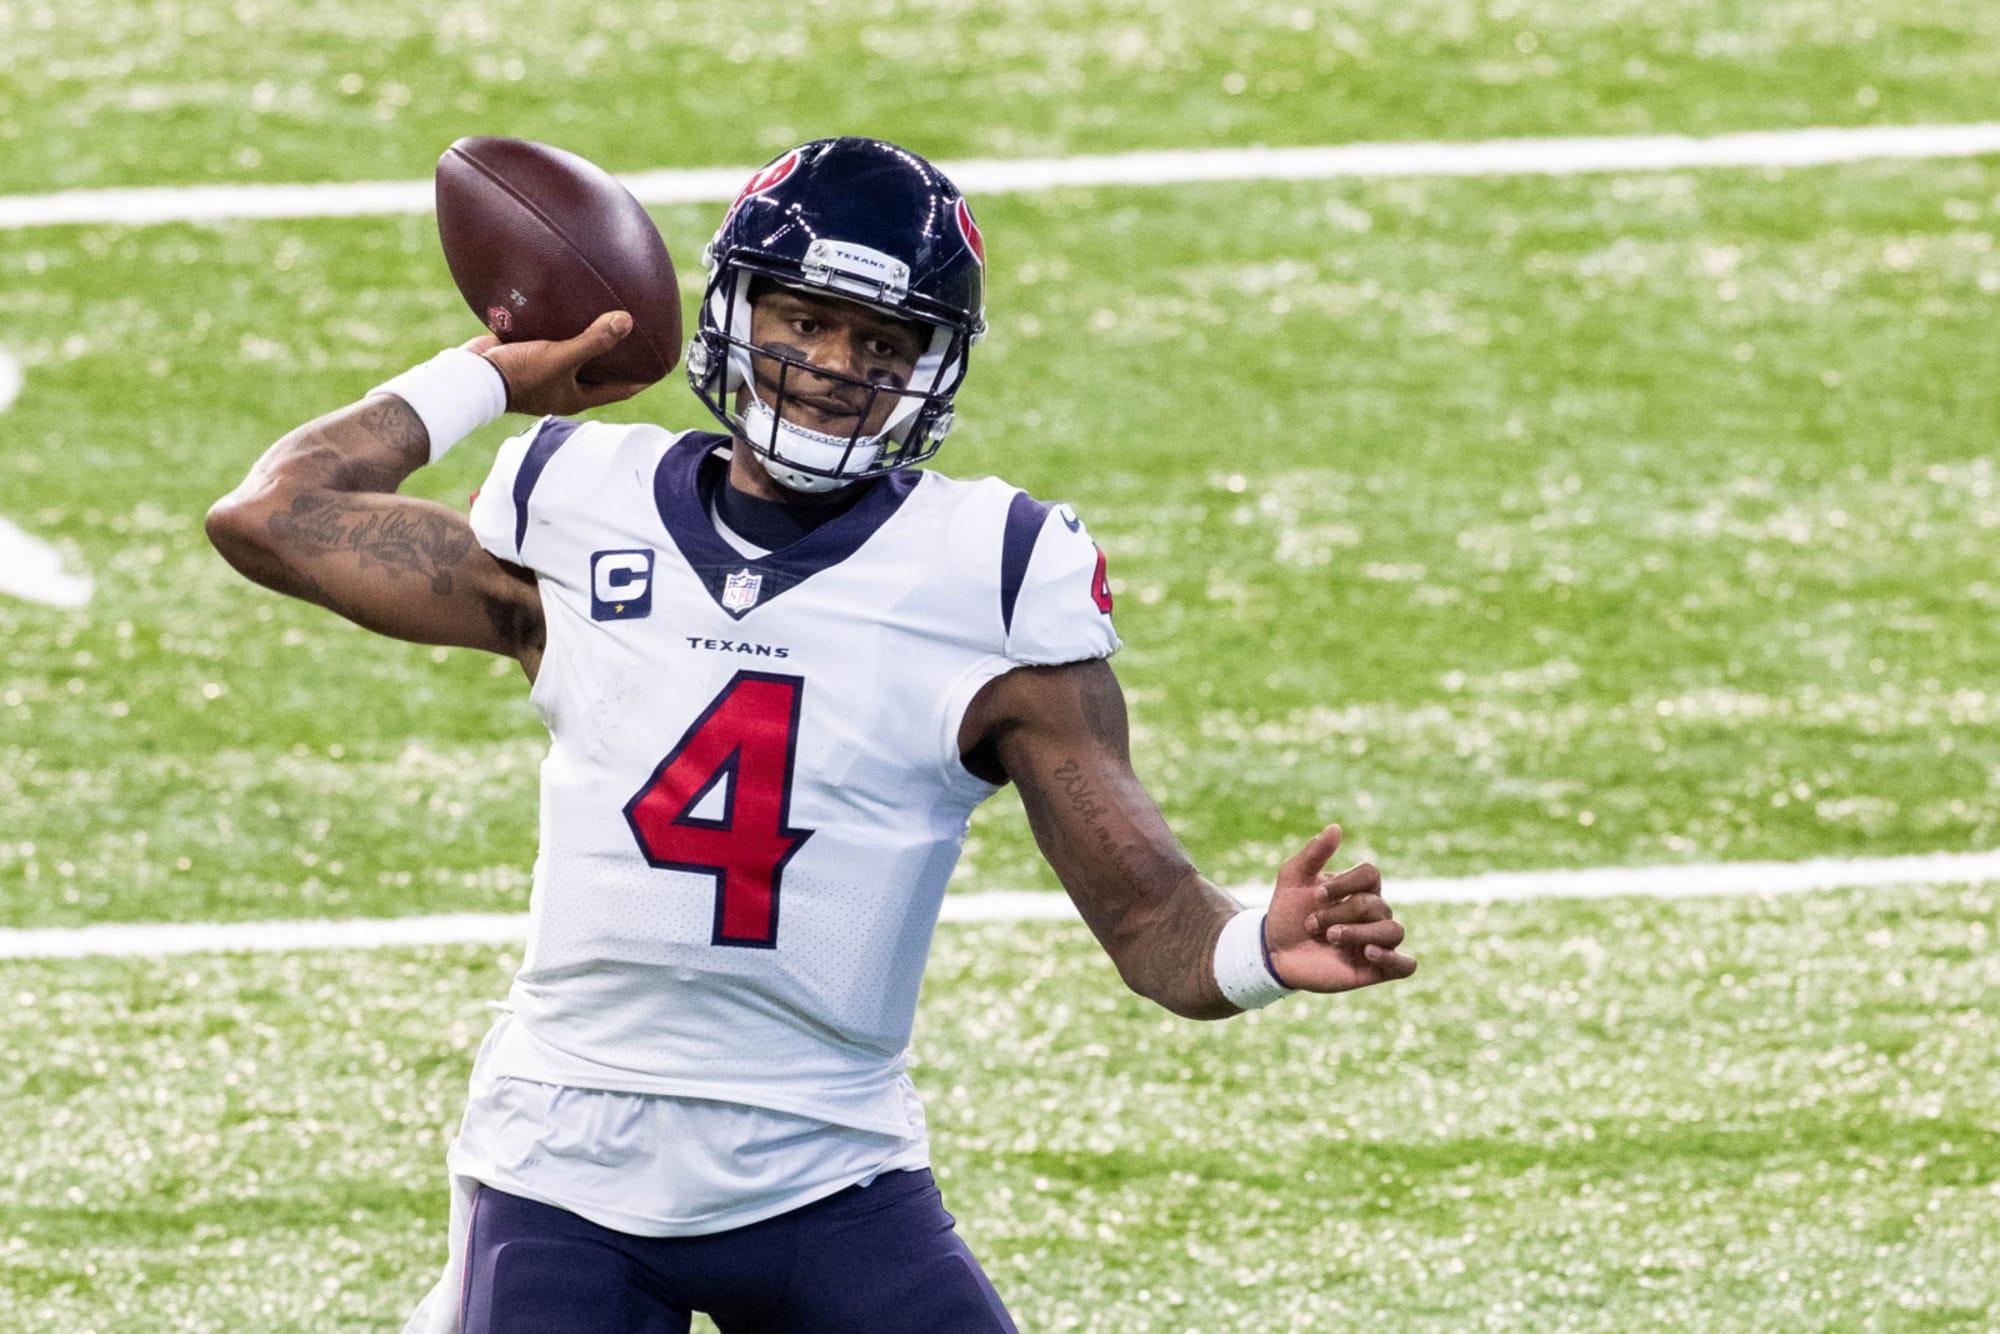 How Washington Football Team can benefit from Deshaun Watson trade